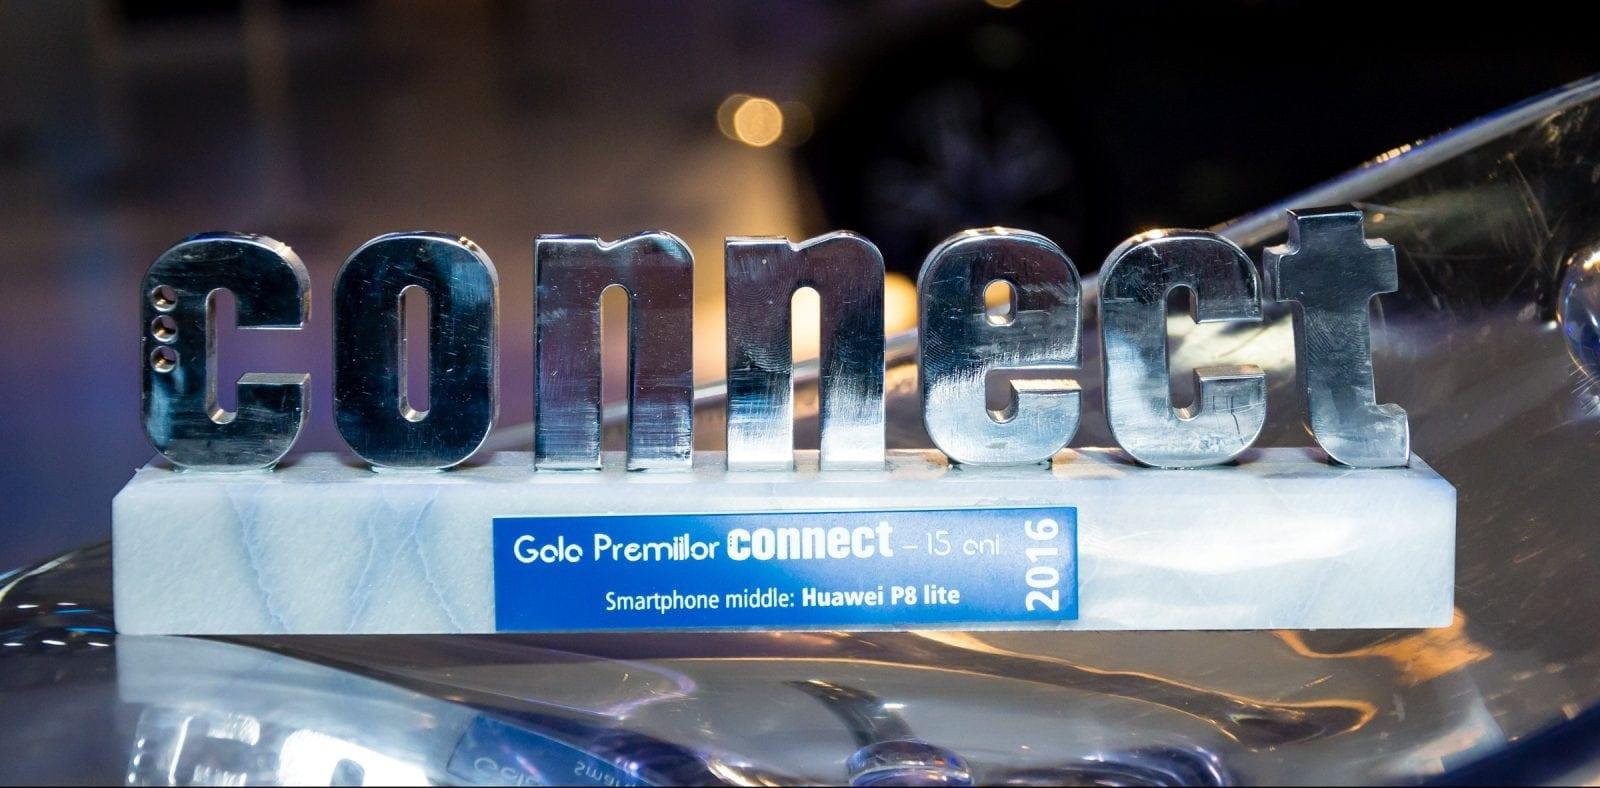 AUR 5129 e1464766601390 - Revista connect: 15 ani de inovație